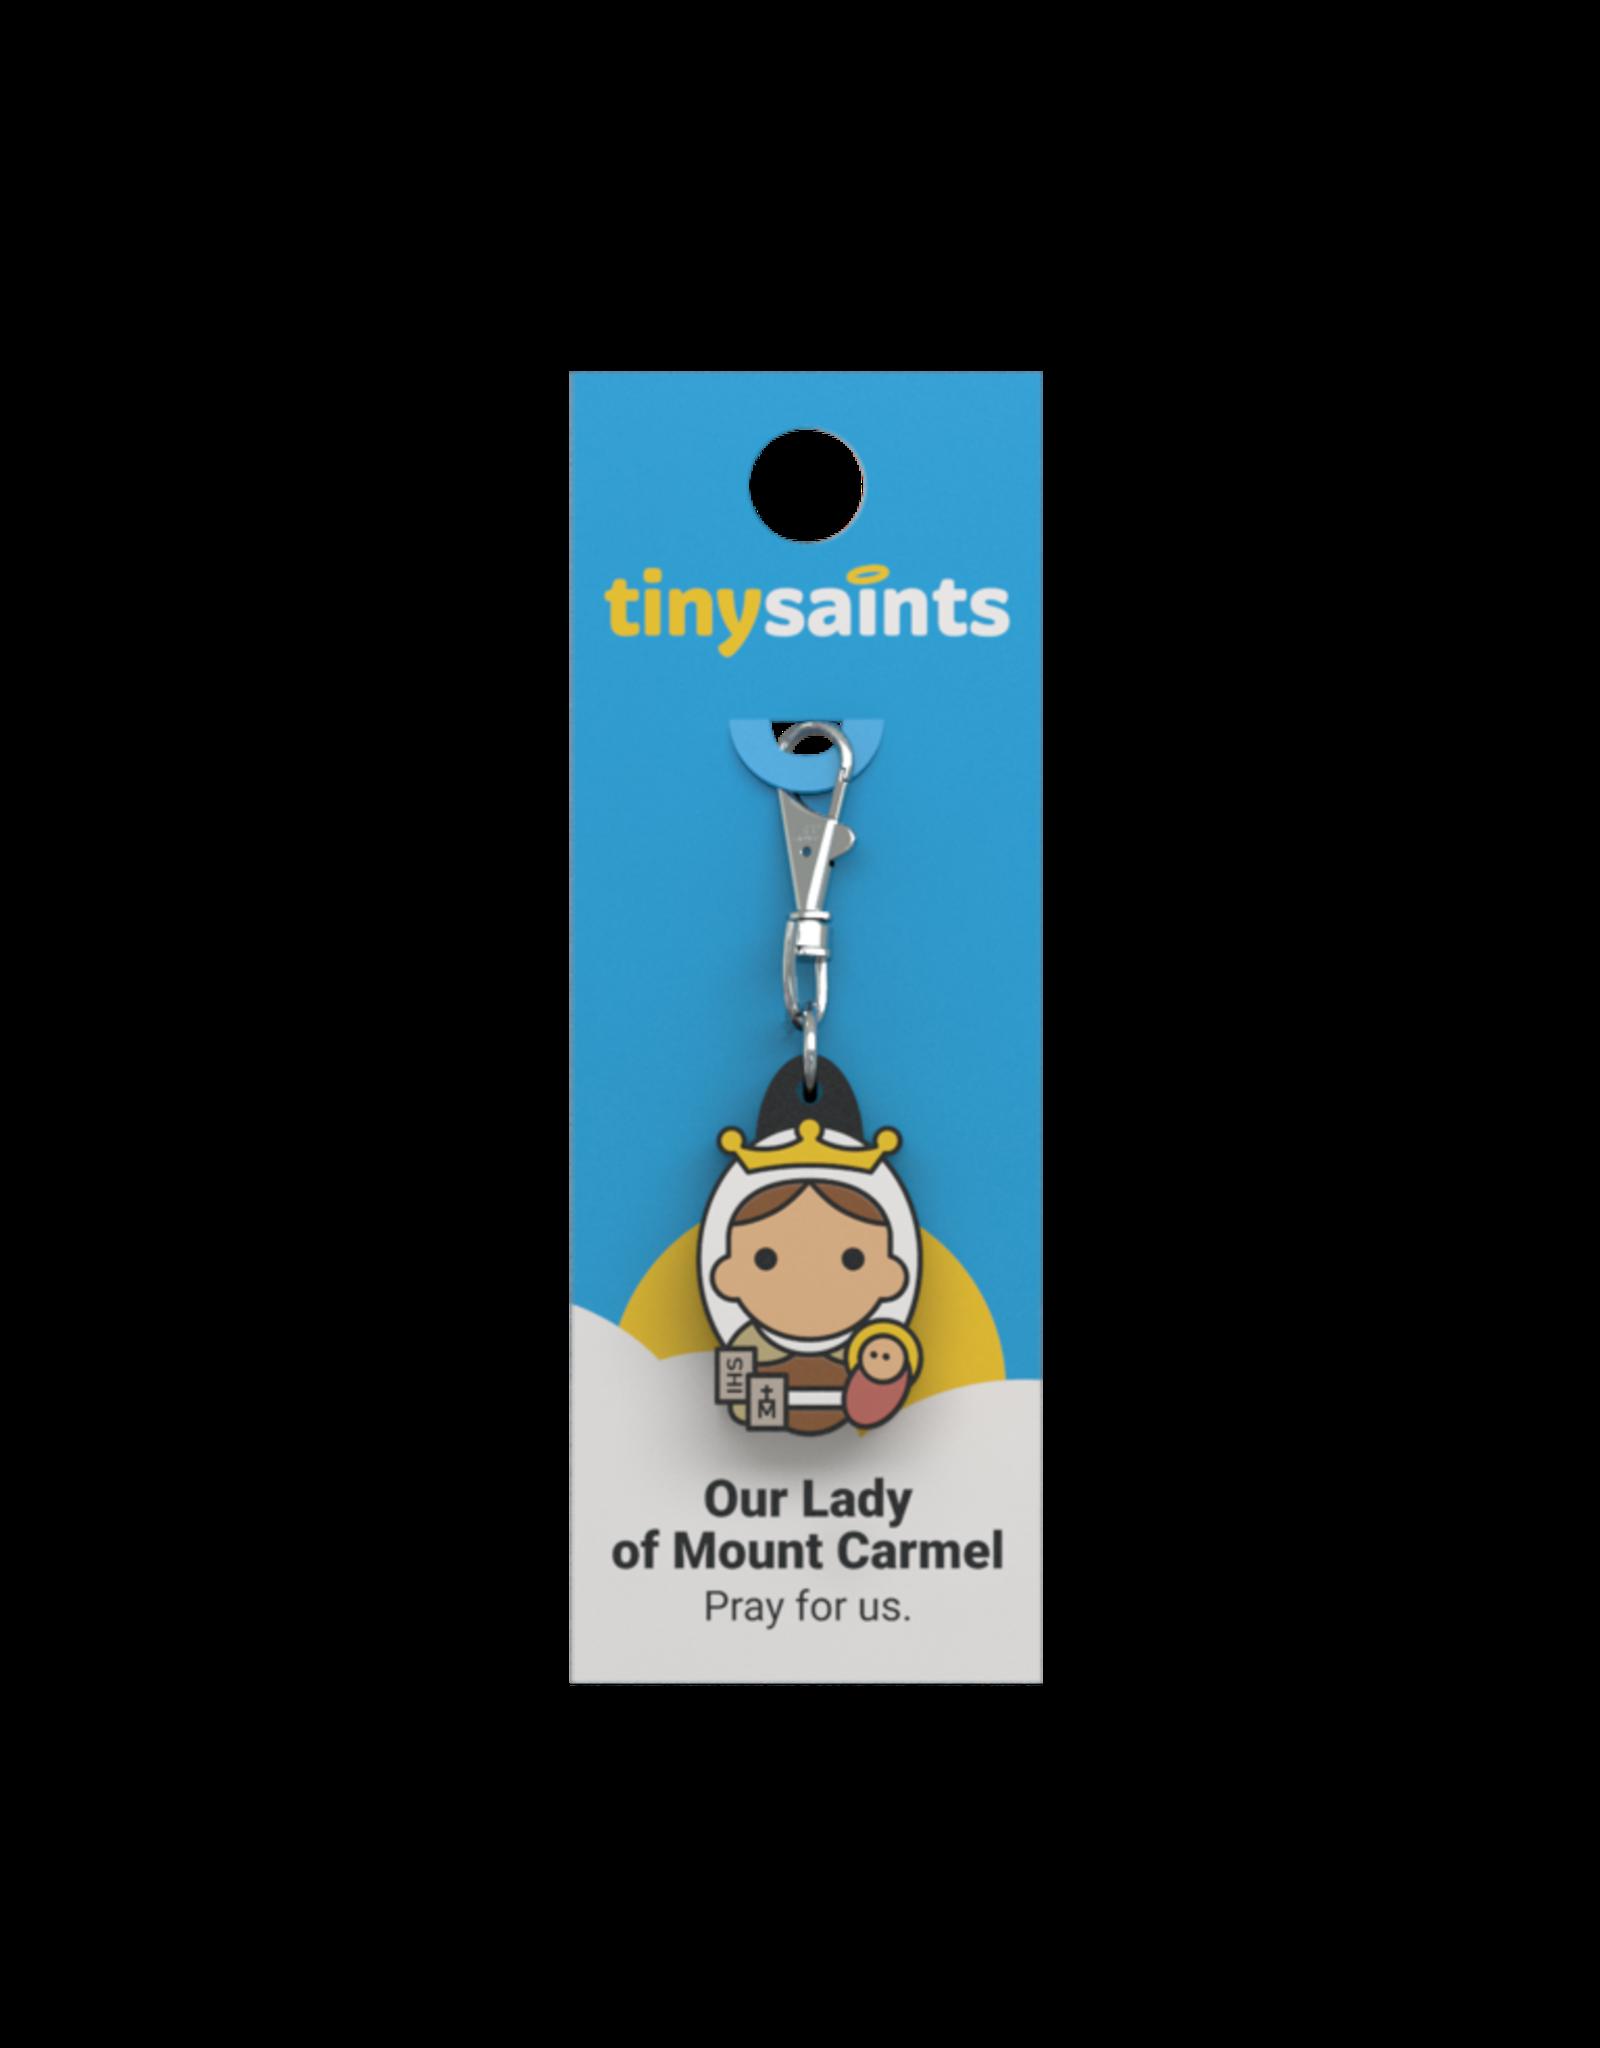 Tiny Saints Tiny Saints Charm - Our Lady of Mount Carmel